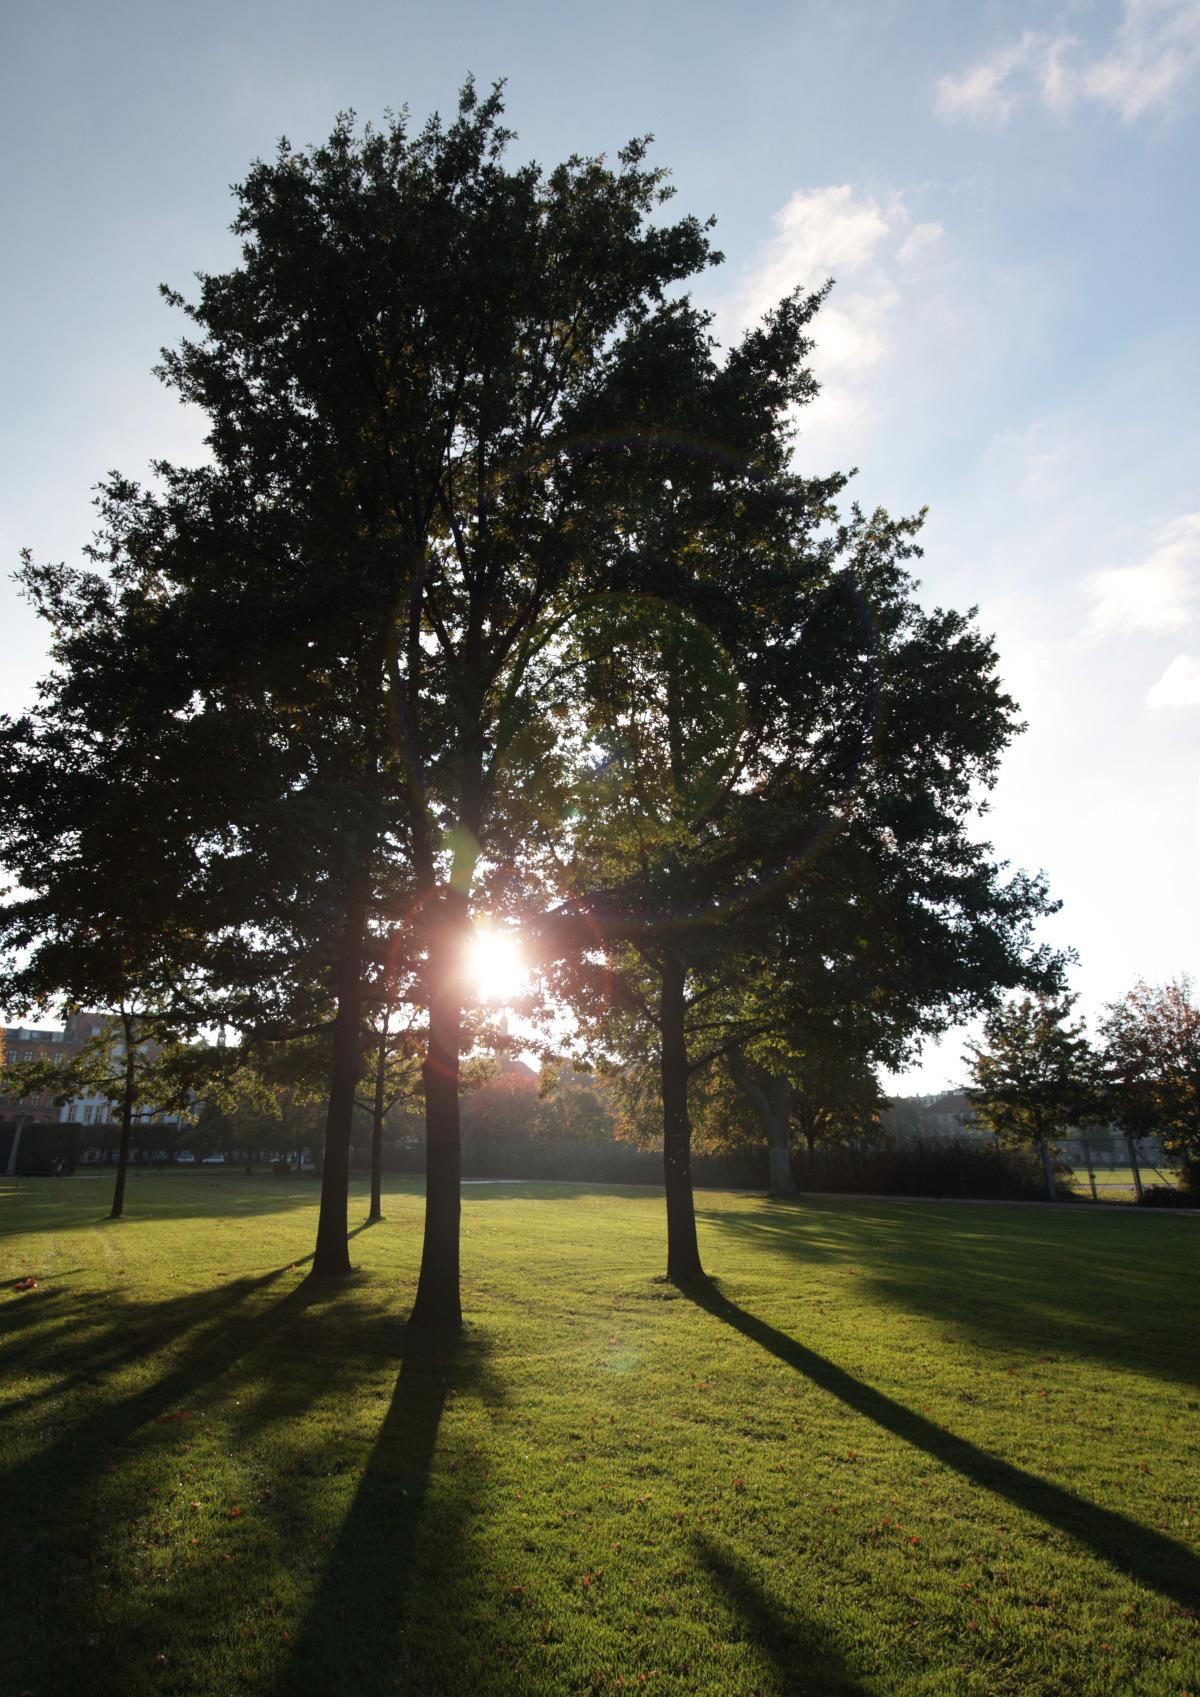 cph_kongens have_tree flare.jpg